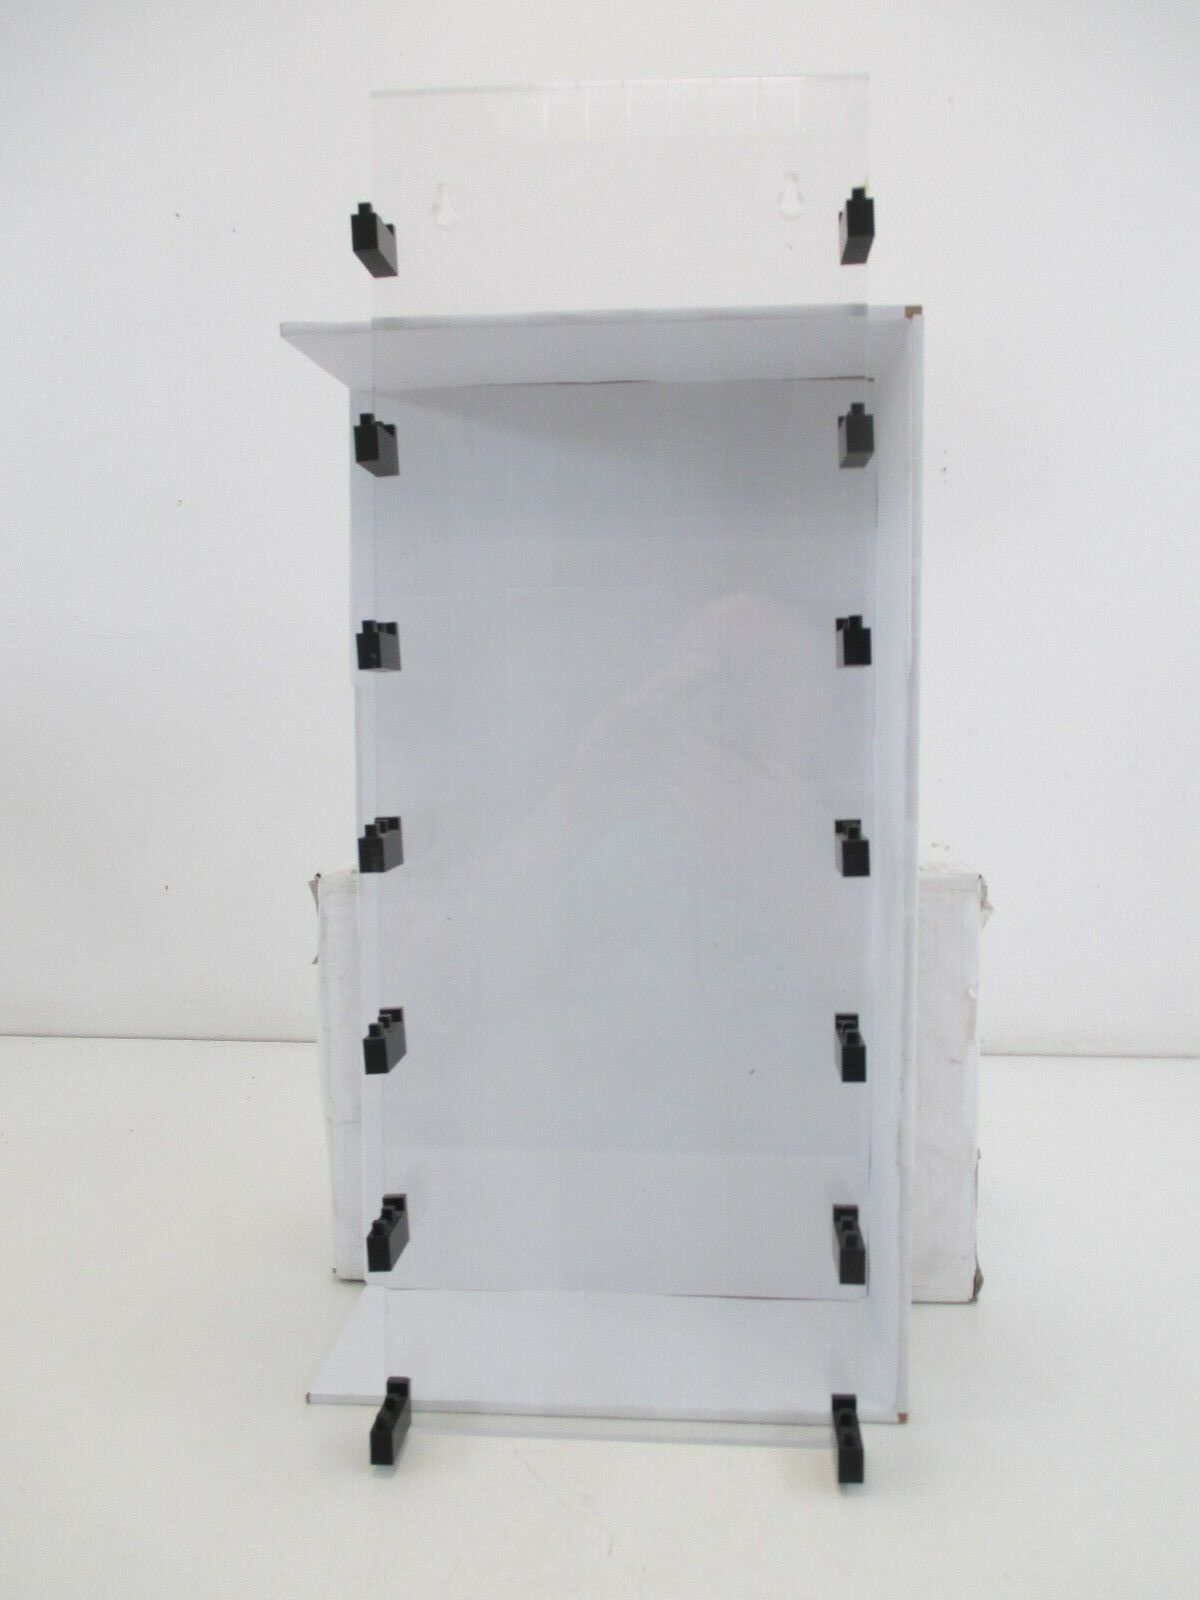 Train-Safe-Vision soporte de parosso pista n wh-n-7s para 7 tubos de 56 cm de largo fw4003